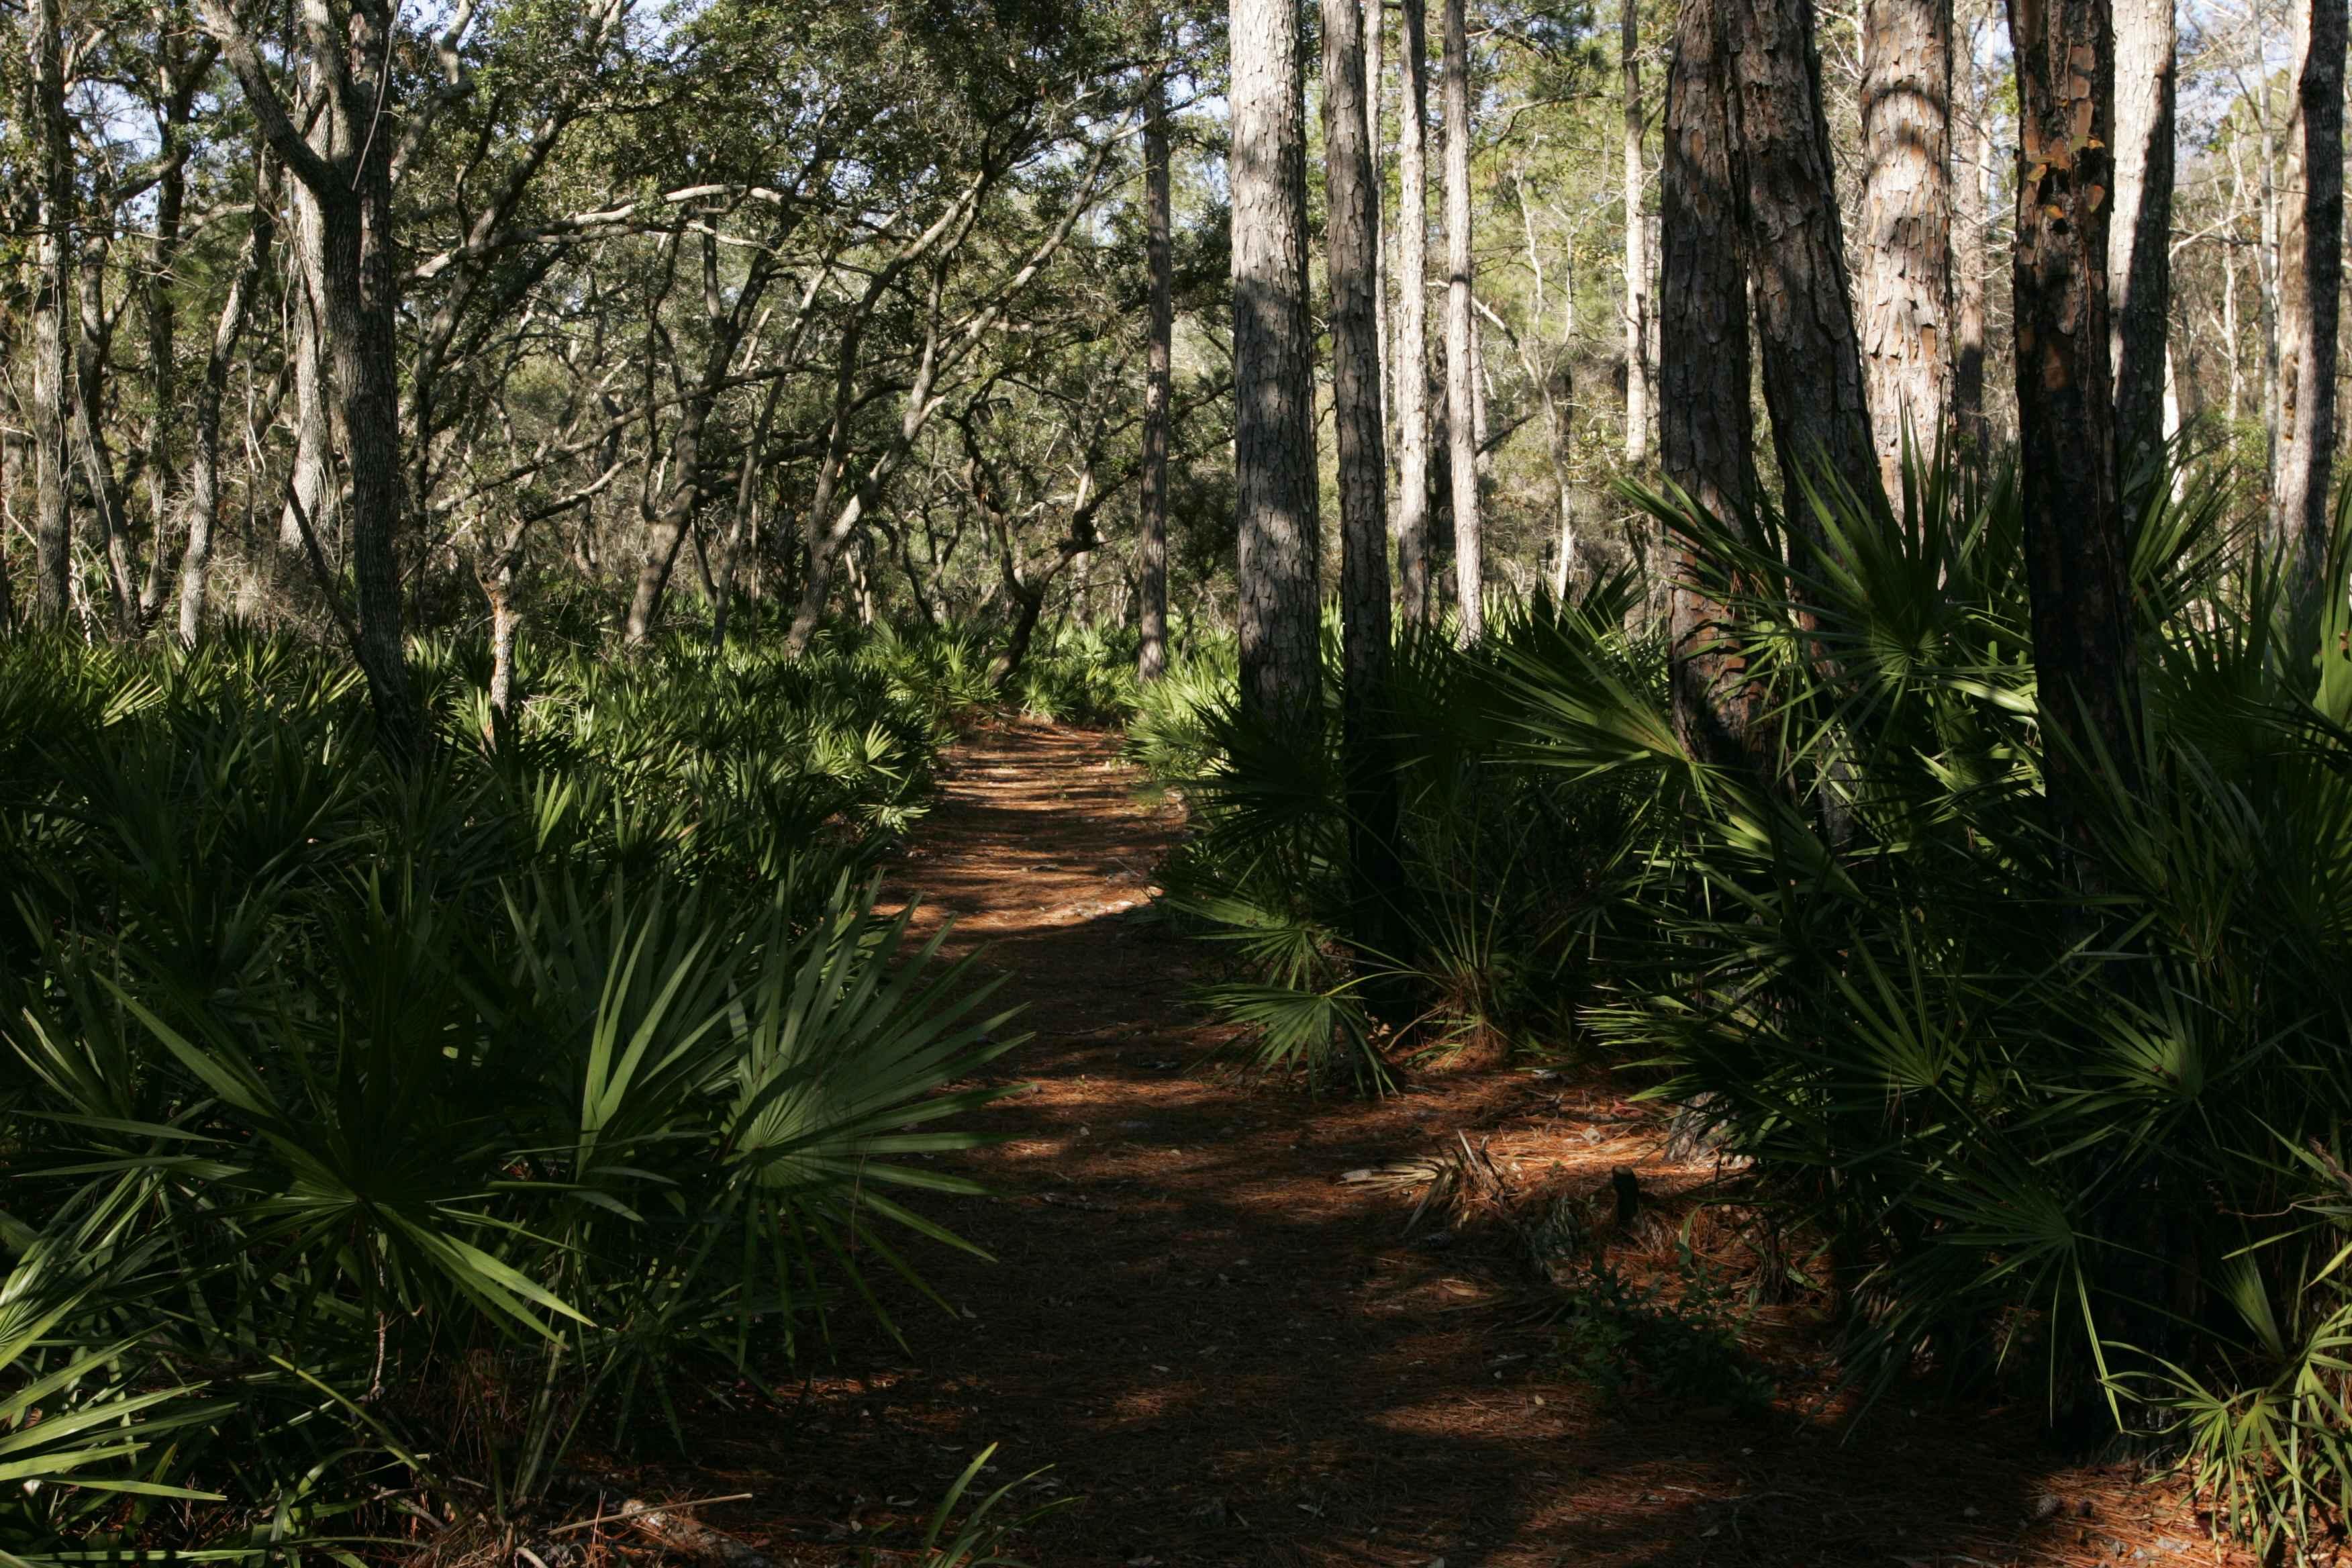 S Tropical Trail Merritt Island Fl